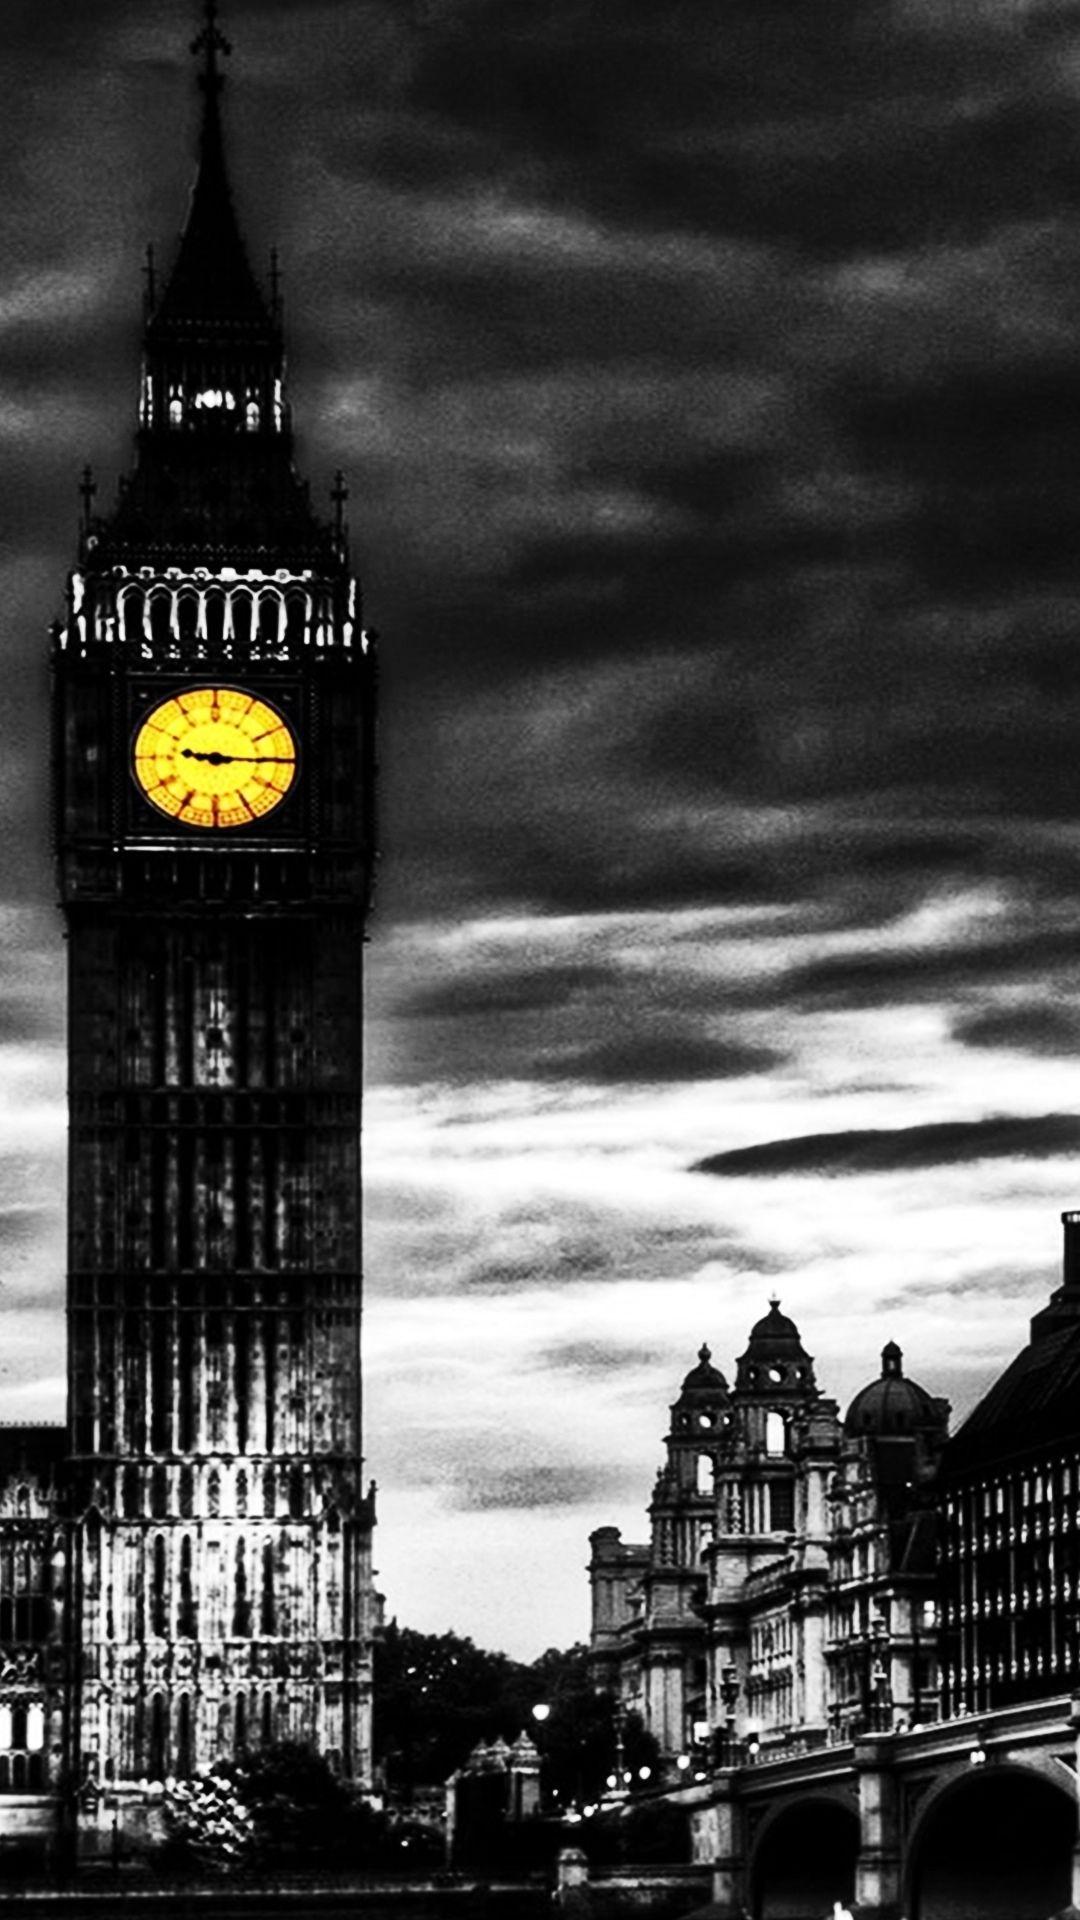 The 1 nexus5 London City Wallpaper I just shared